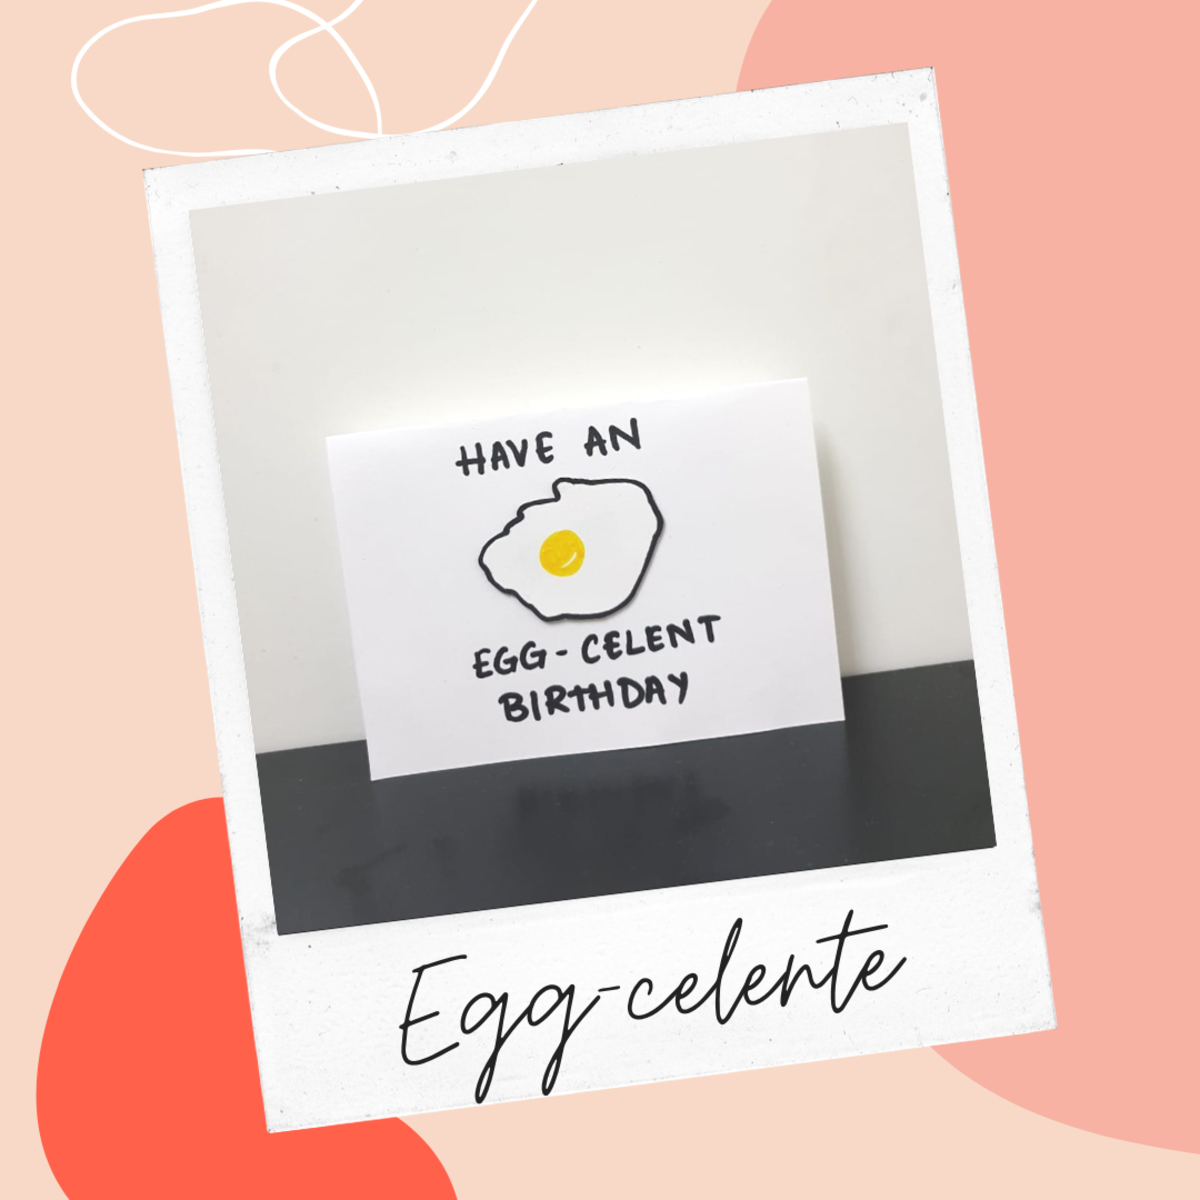 Egg-celent Birthday Greeting Card Idea